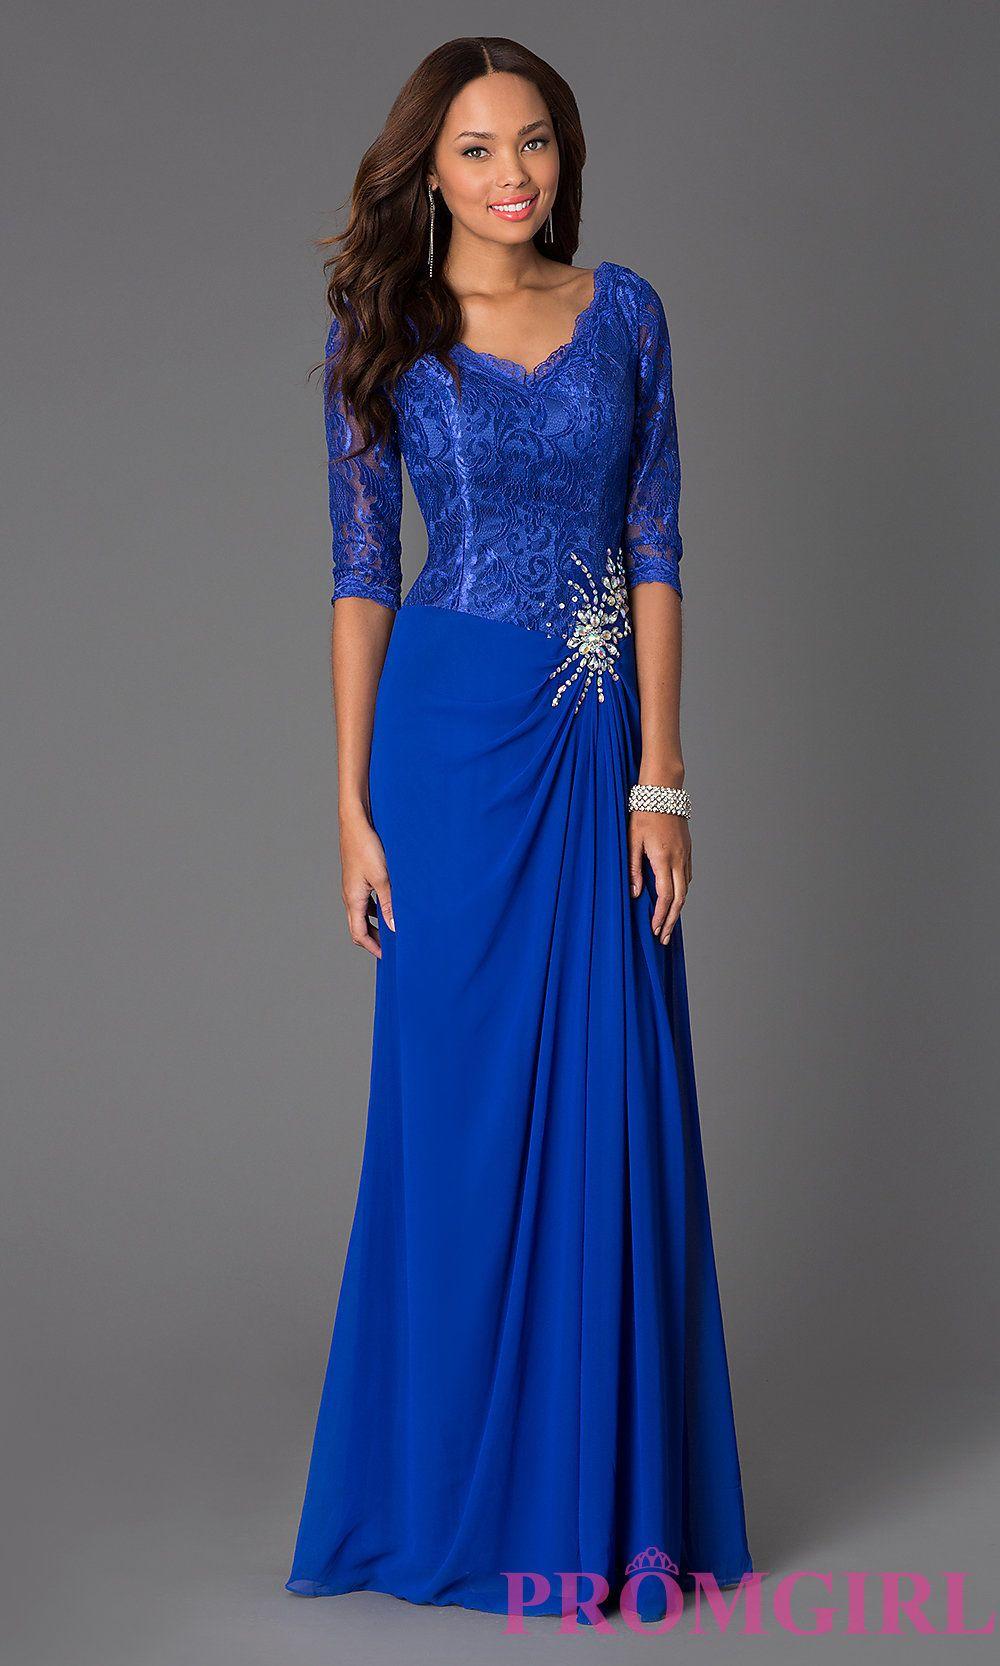 Prom dresses celebrity dresses sexy evening gowns floor length v